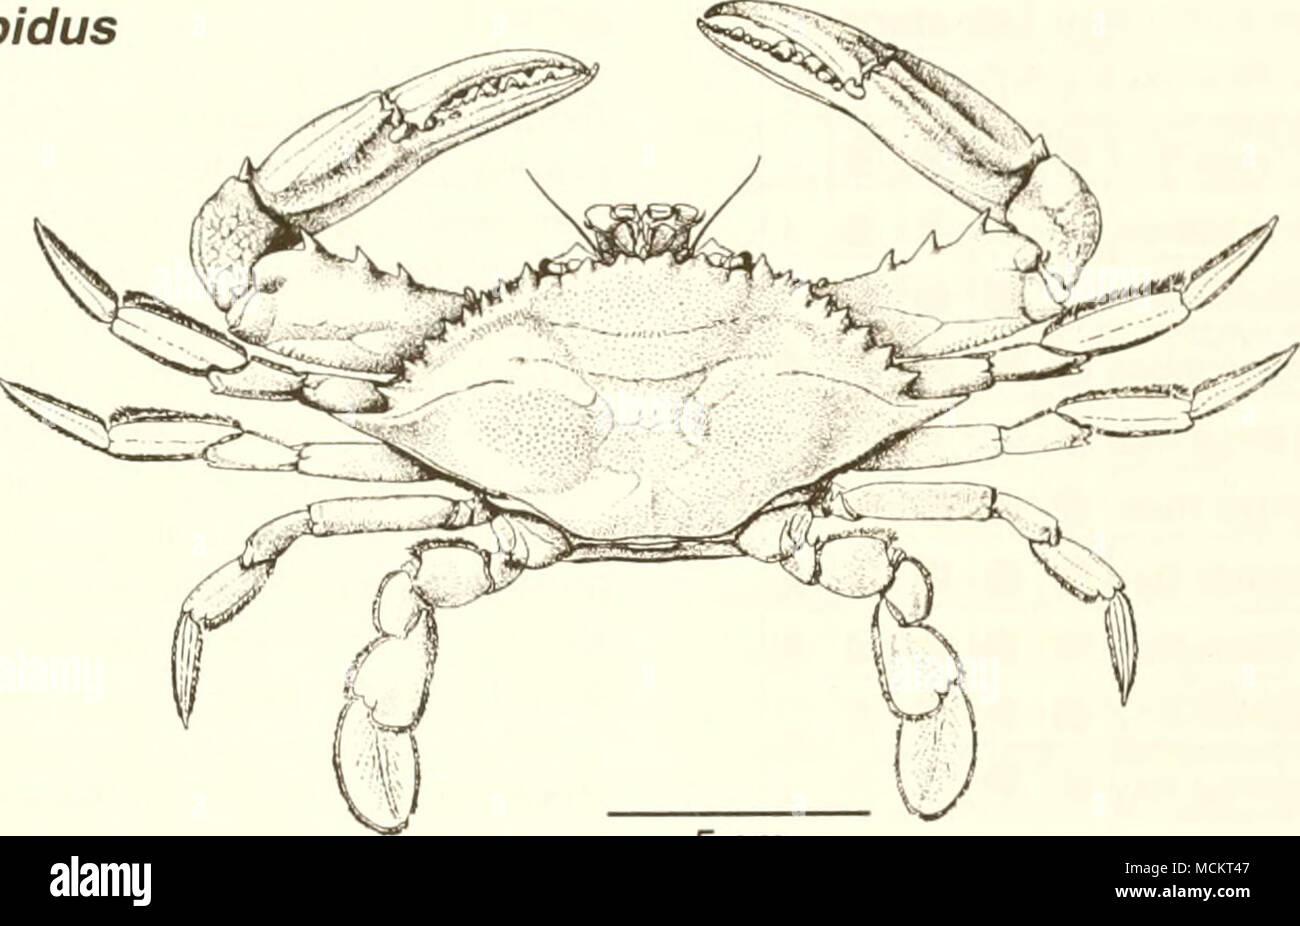 Common Edible Crab Stock Photos & Common Edible Crab Stock Images ...